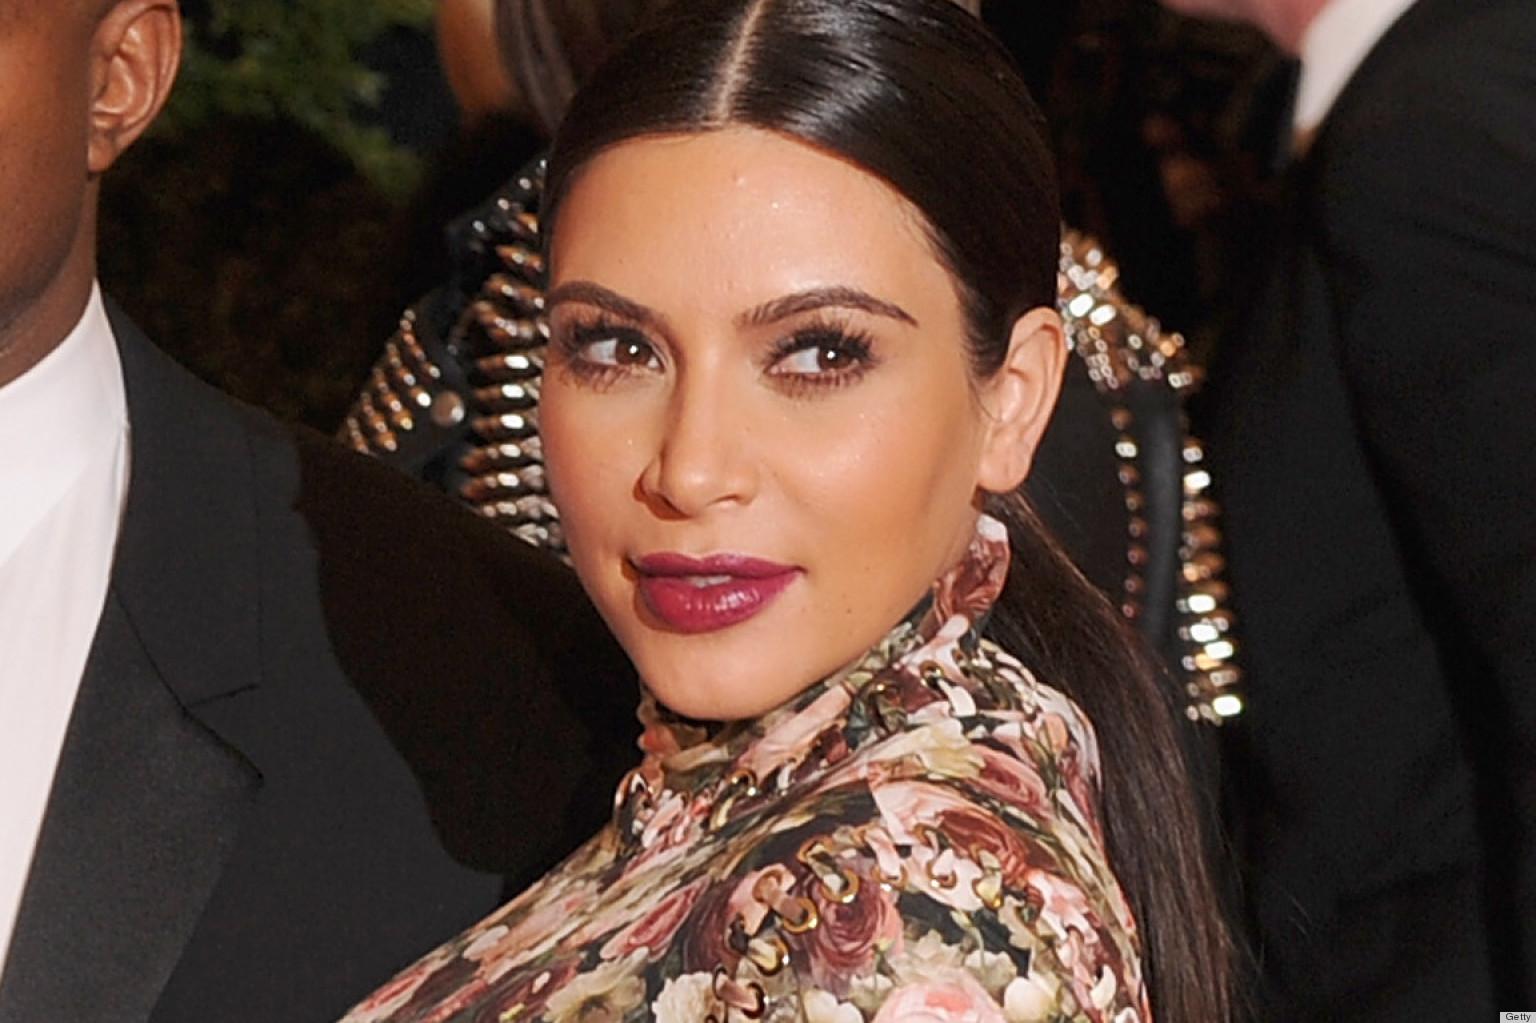 Riccardo Tisci Defends Kim Kardashian's Met Gala Dress